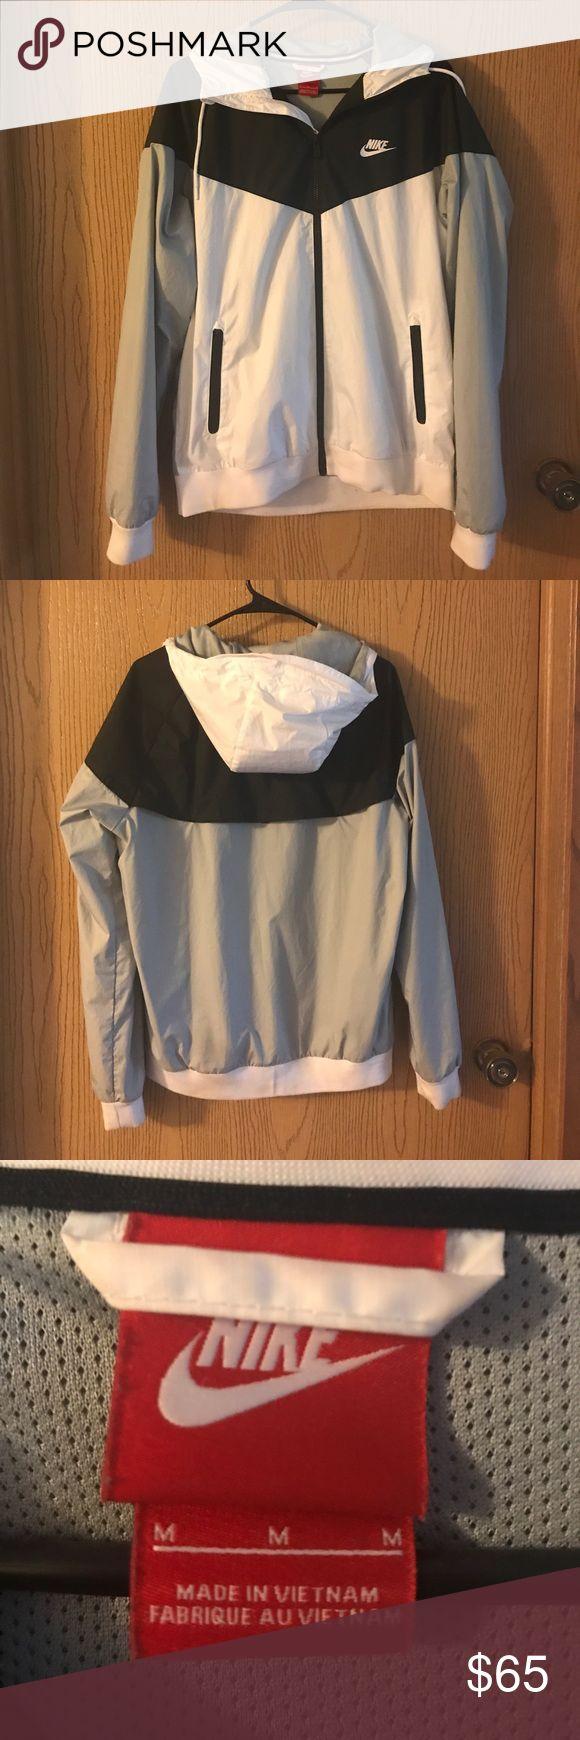 Nike Rain Jacket Black, white, and grey Nike rain jacket. Very good condition Nike Jackets & Coats